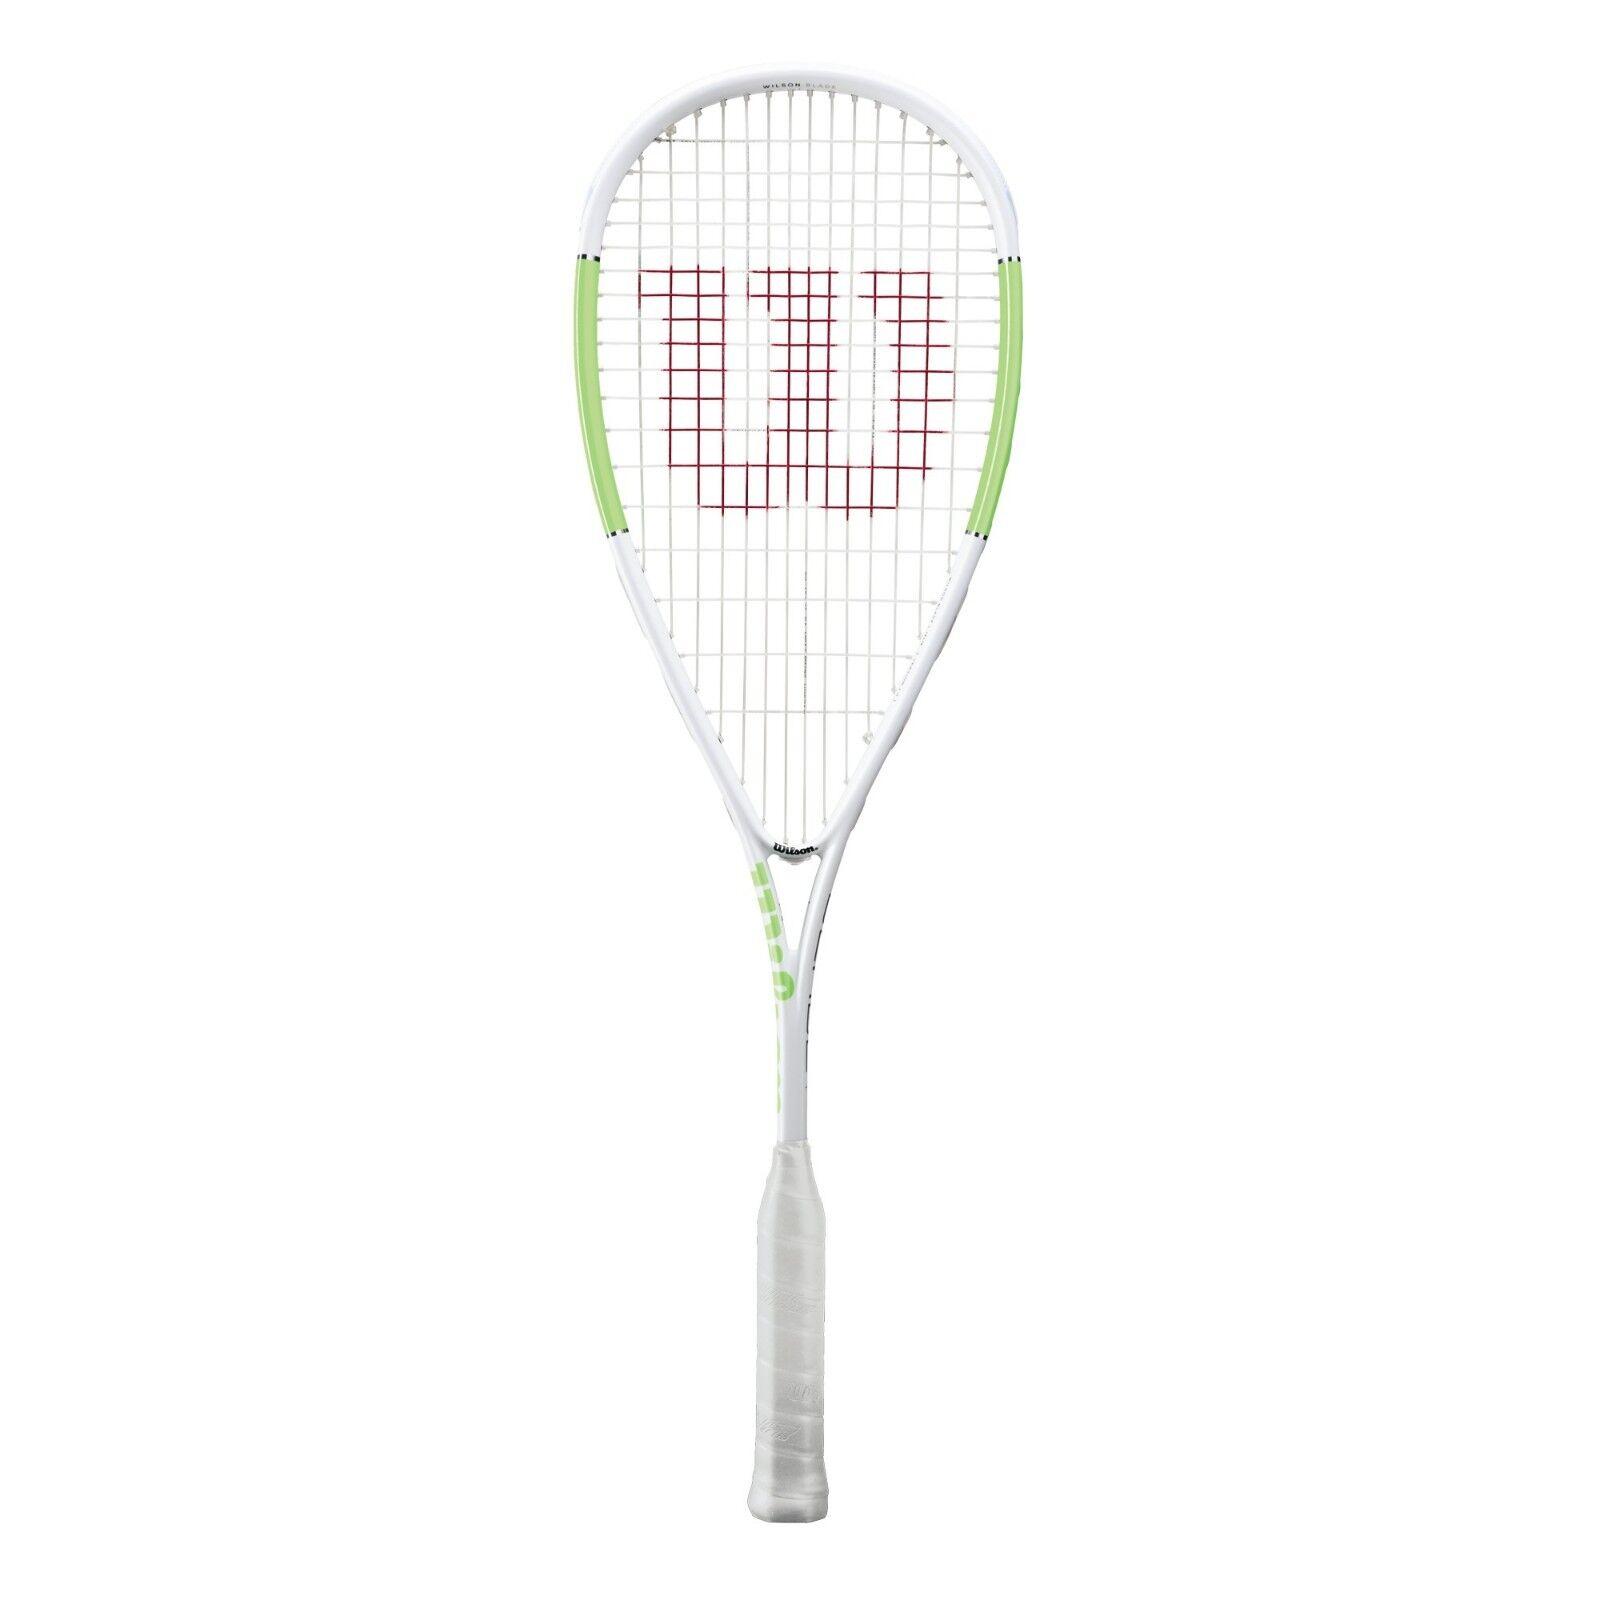 WILSON Blade Ultra Lite Squash racquet - Authorized Dealer w  Warranty-Reg